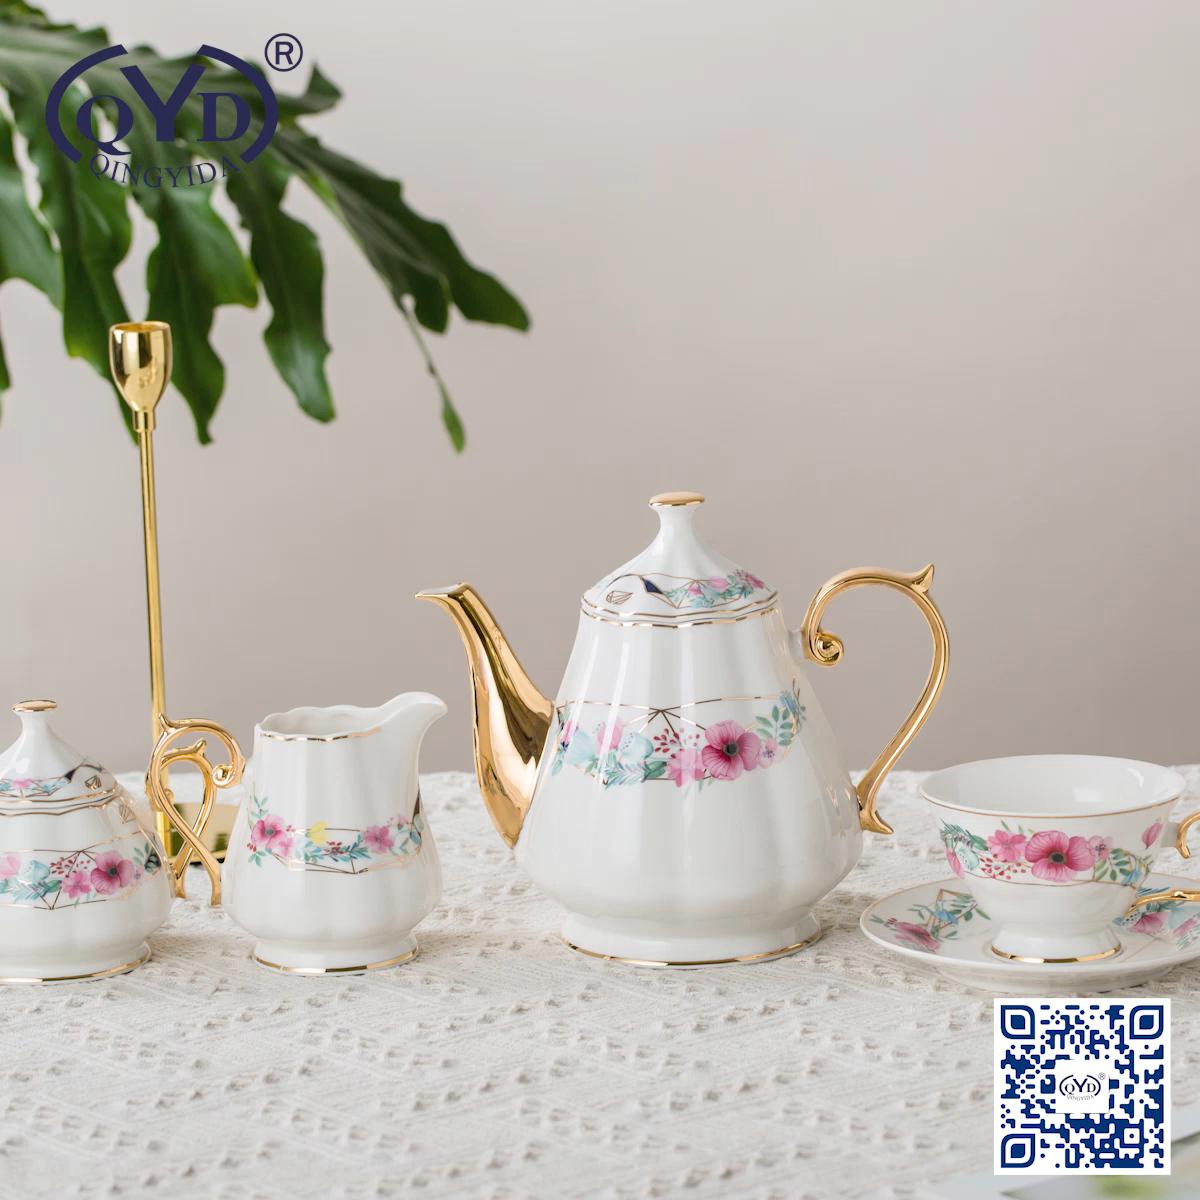 Rose design ceramic tea cups stock fine porcelain china coffee cup and saucer set